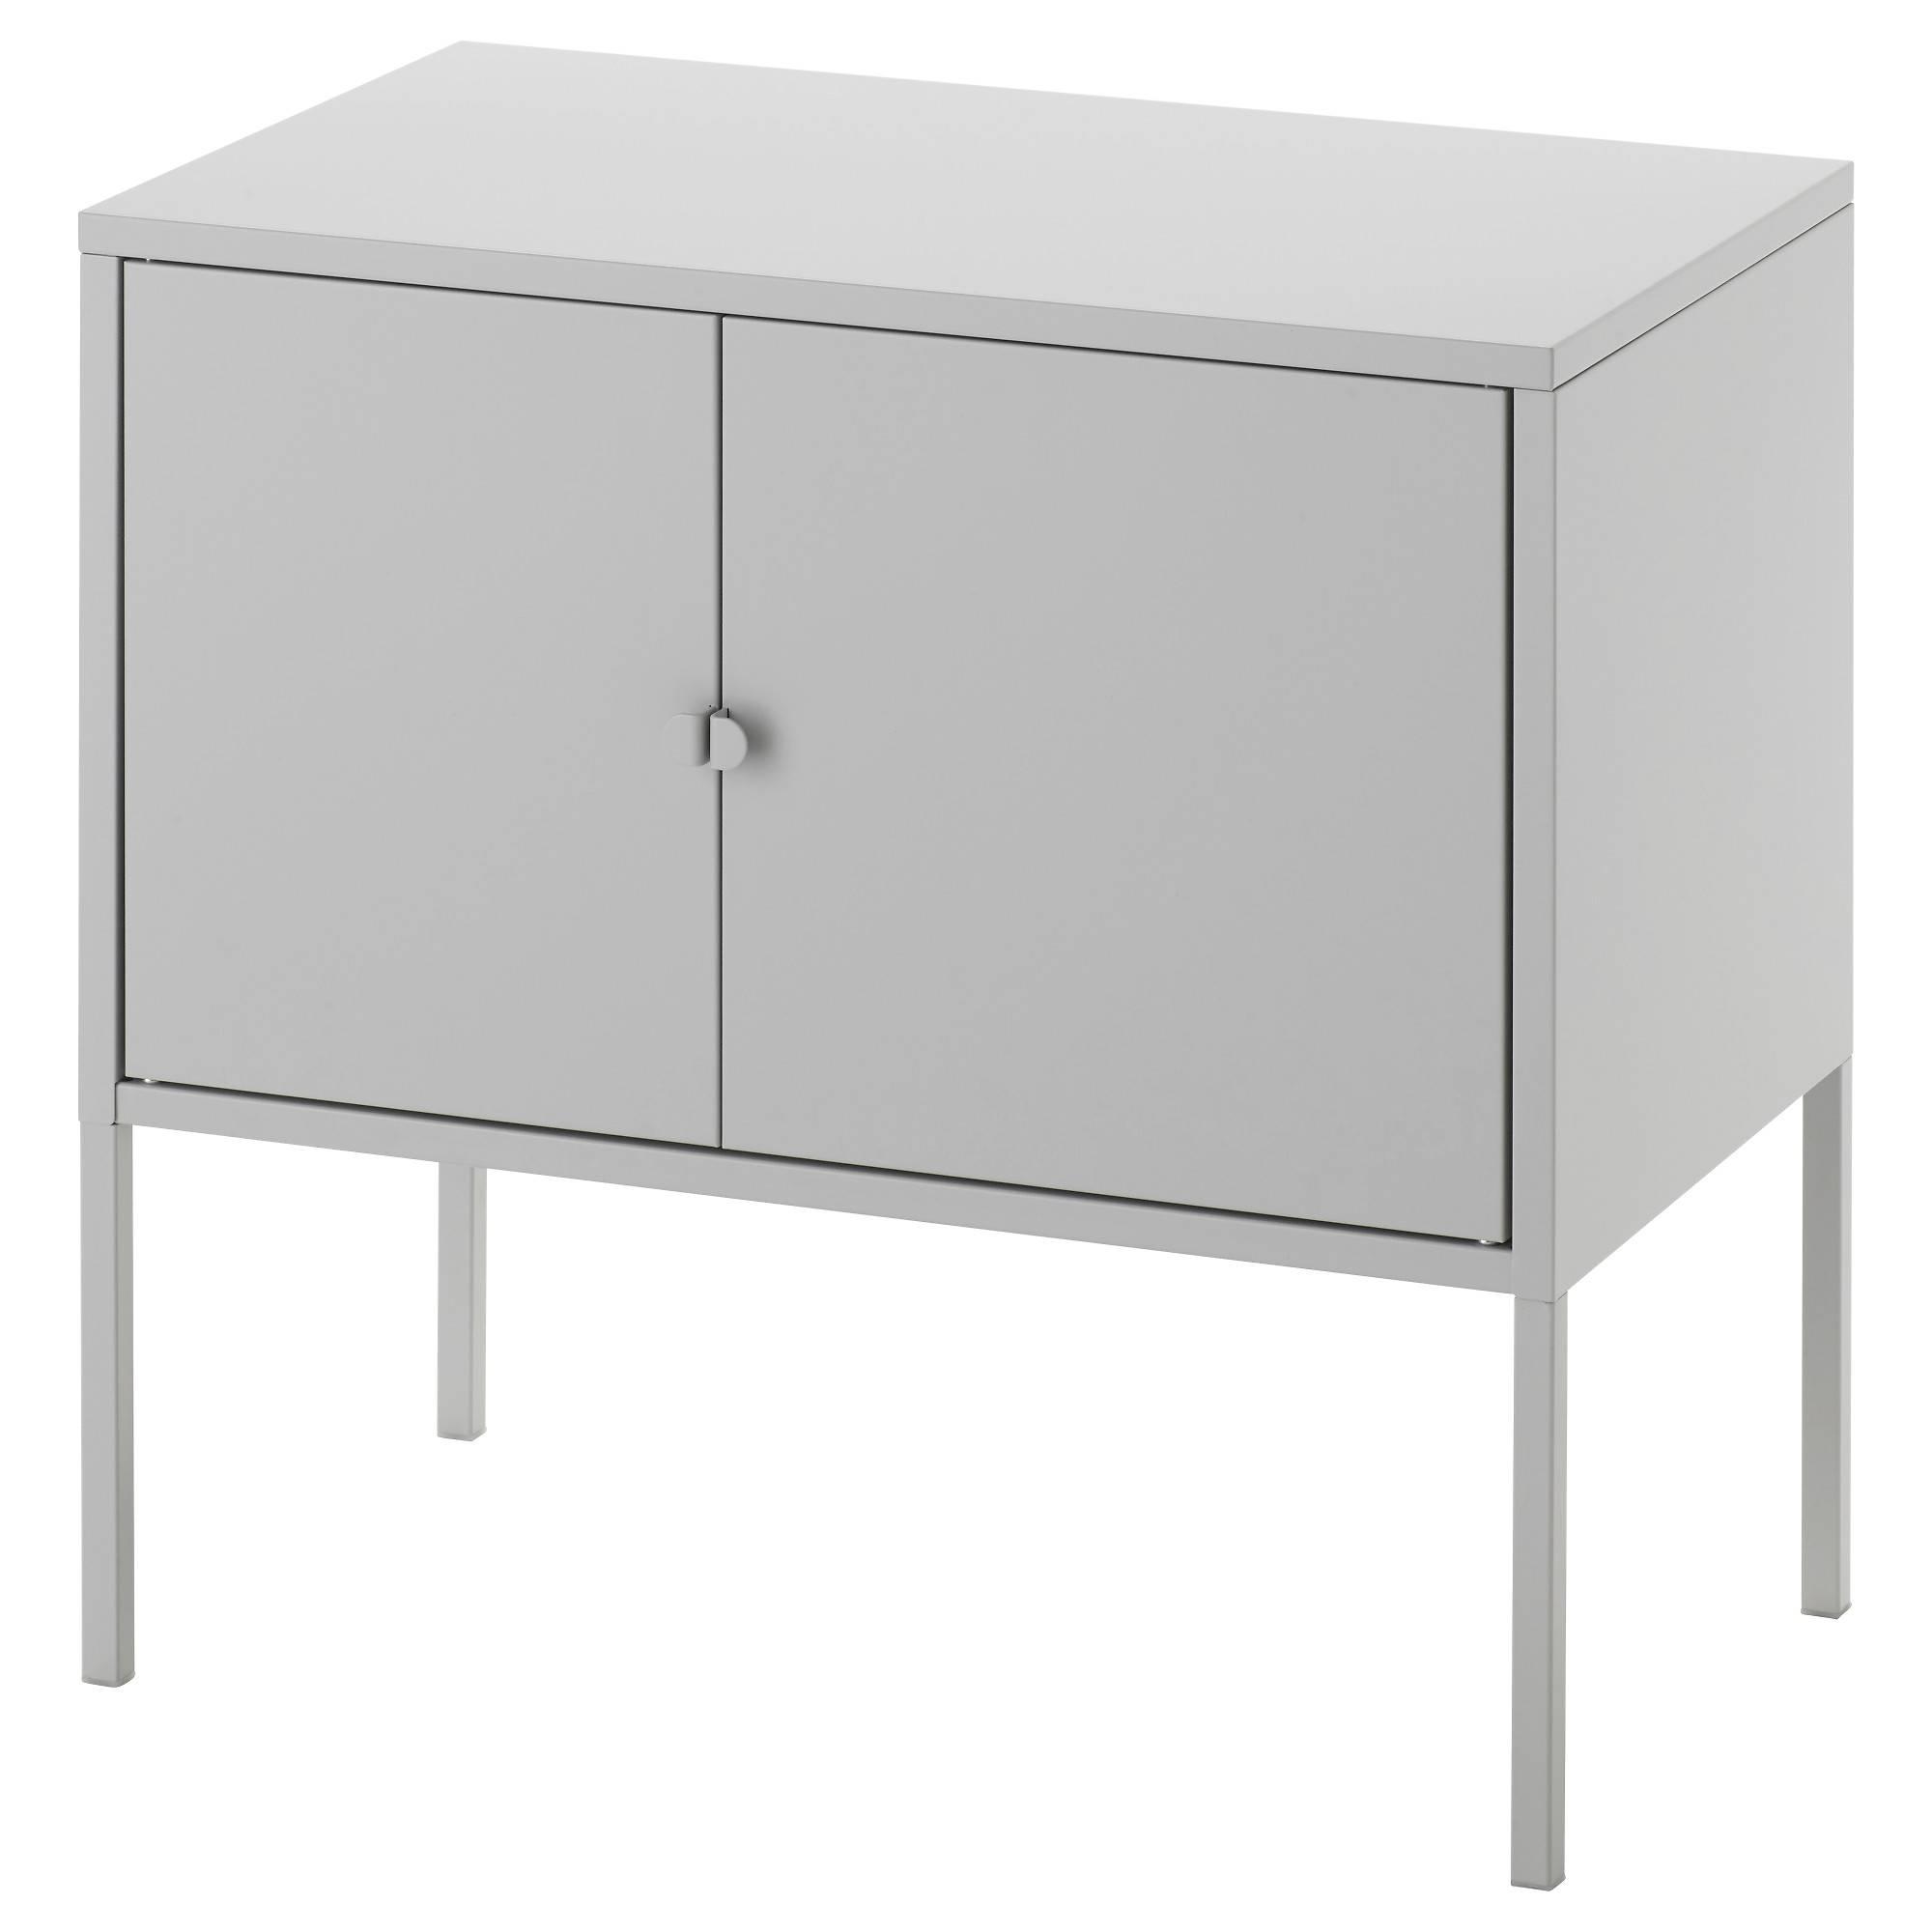 Cabinets & Sideboards – Ikea Regarding 12 Inch Deep Sideboard (View 7 of 20)